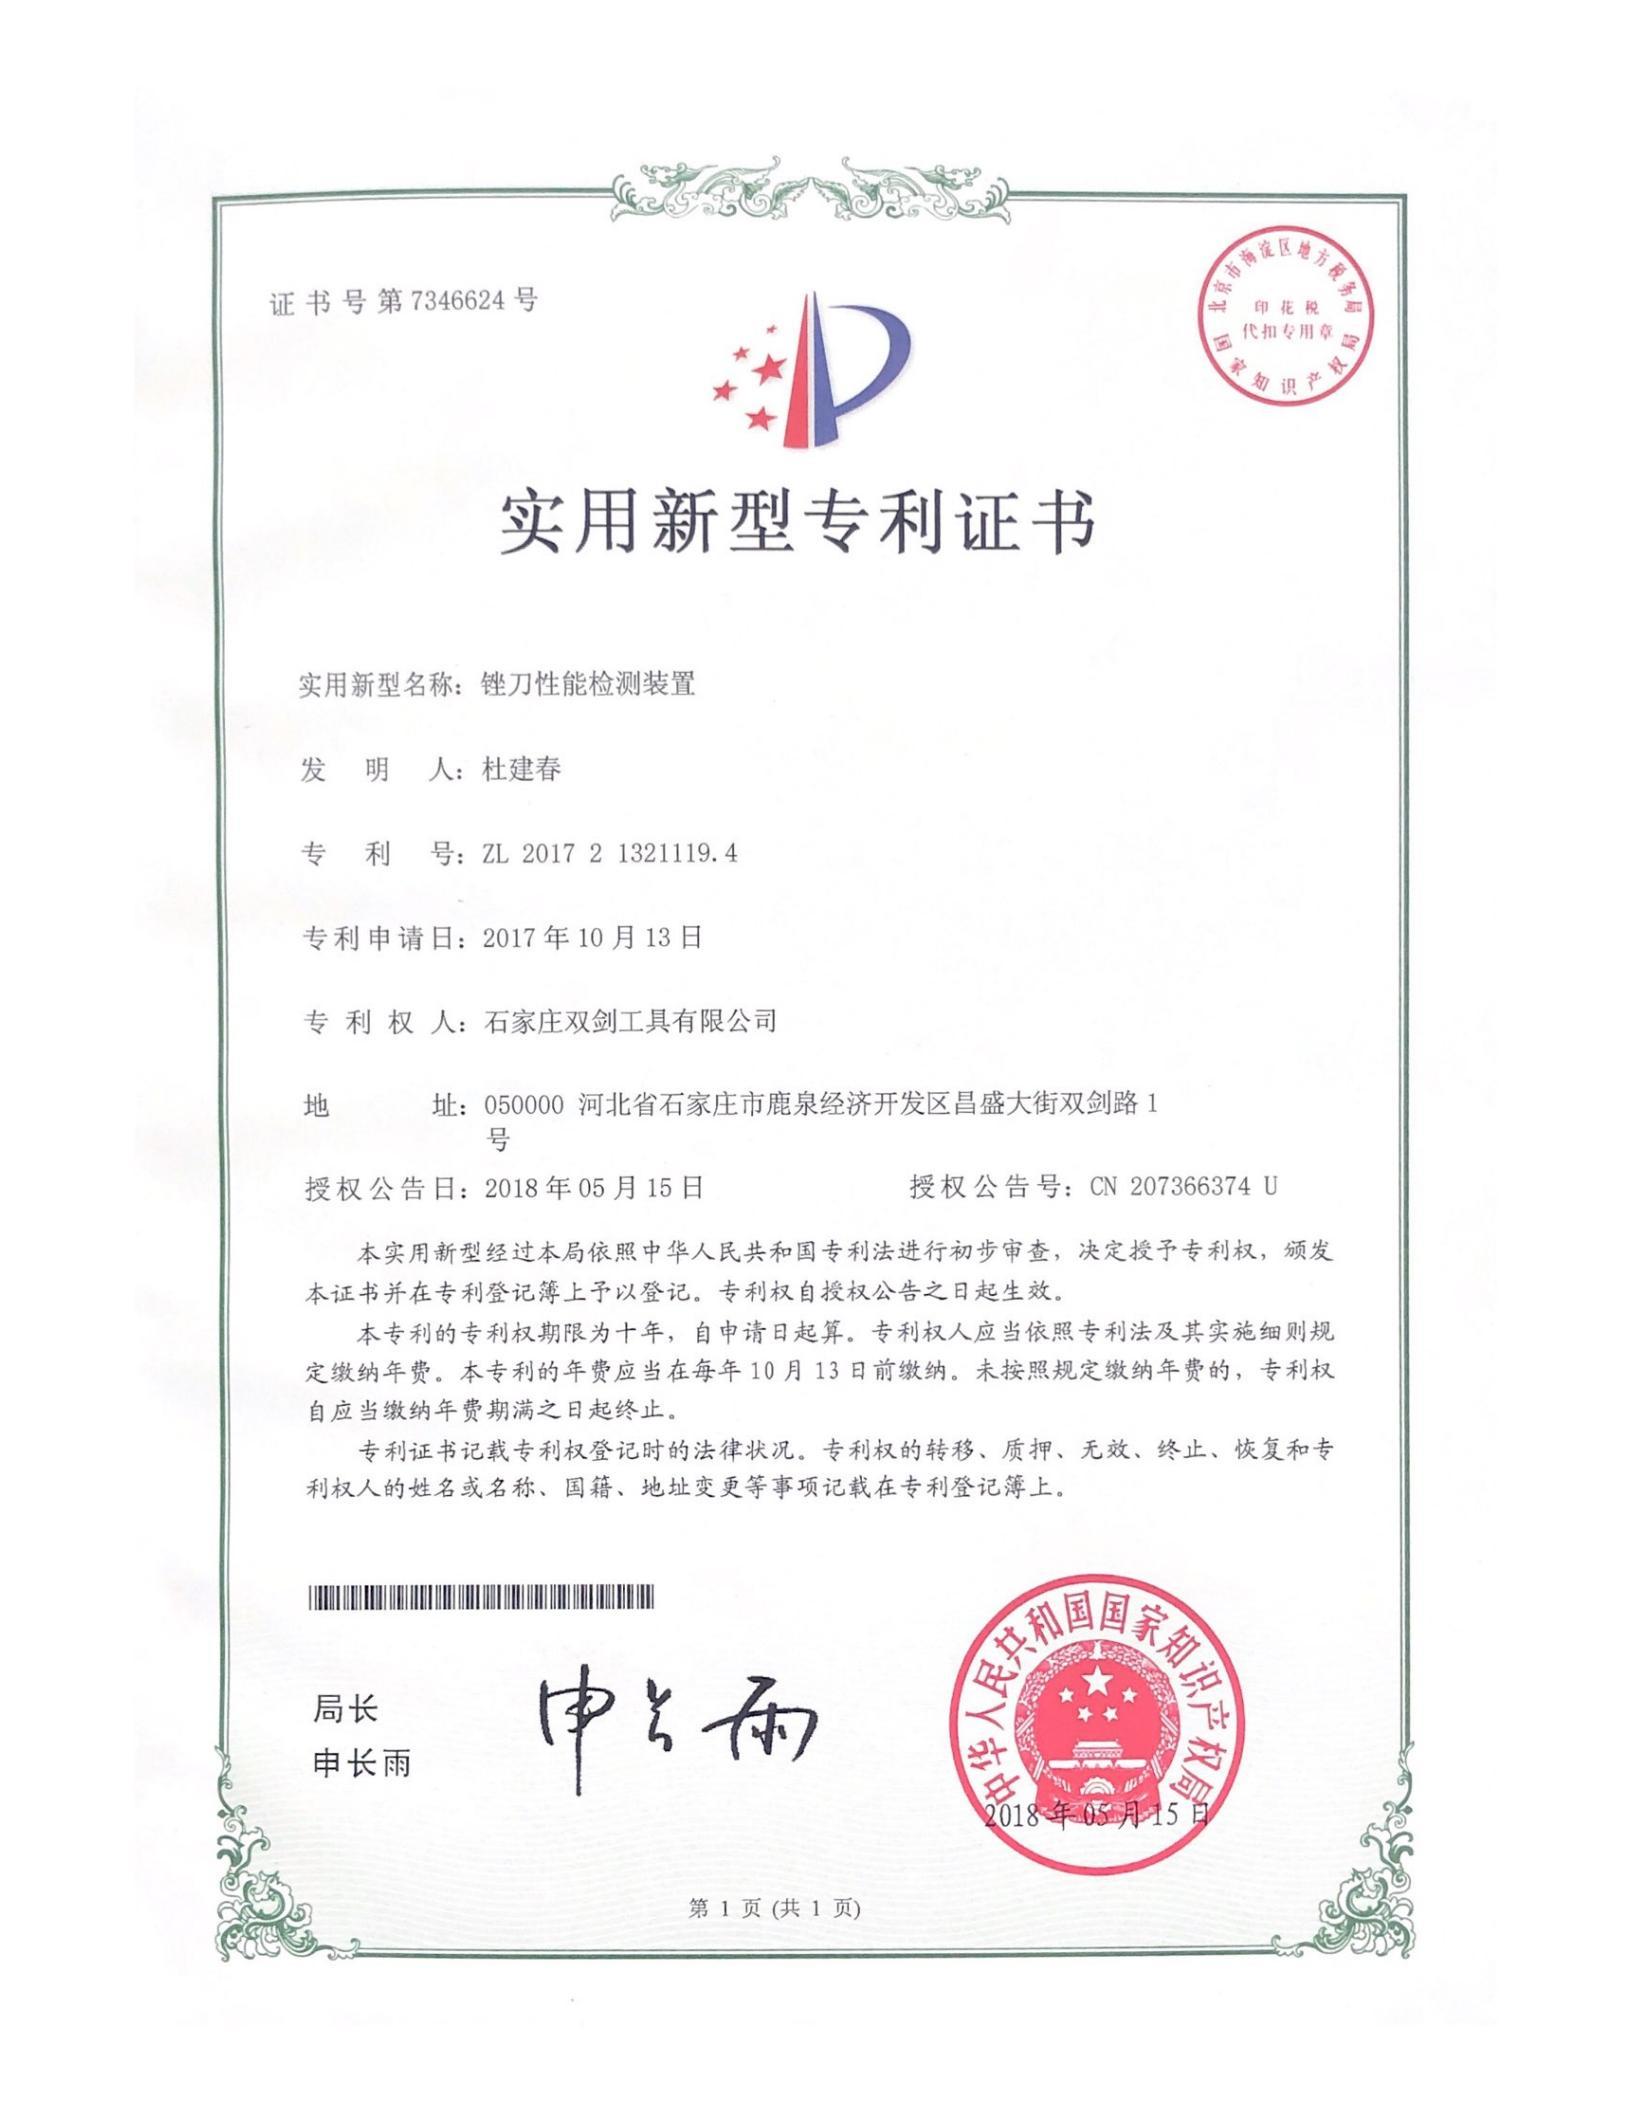 Utility Model Patent Certificate No. 7346624